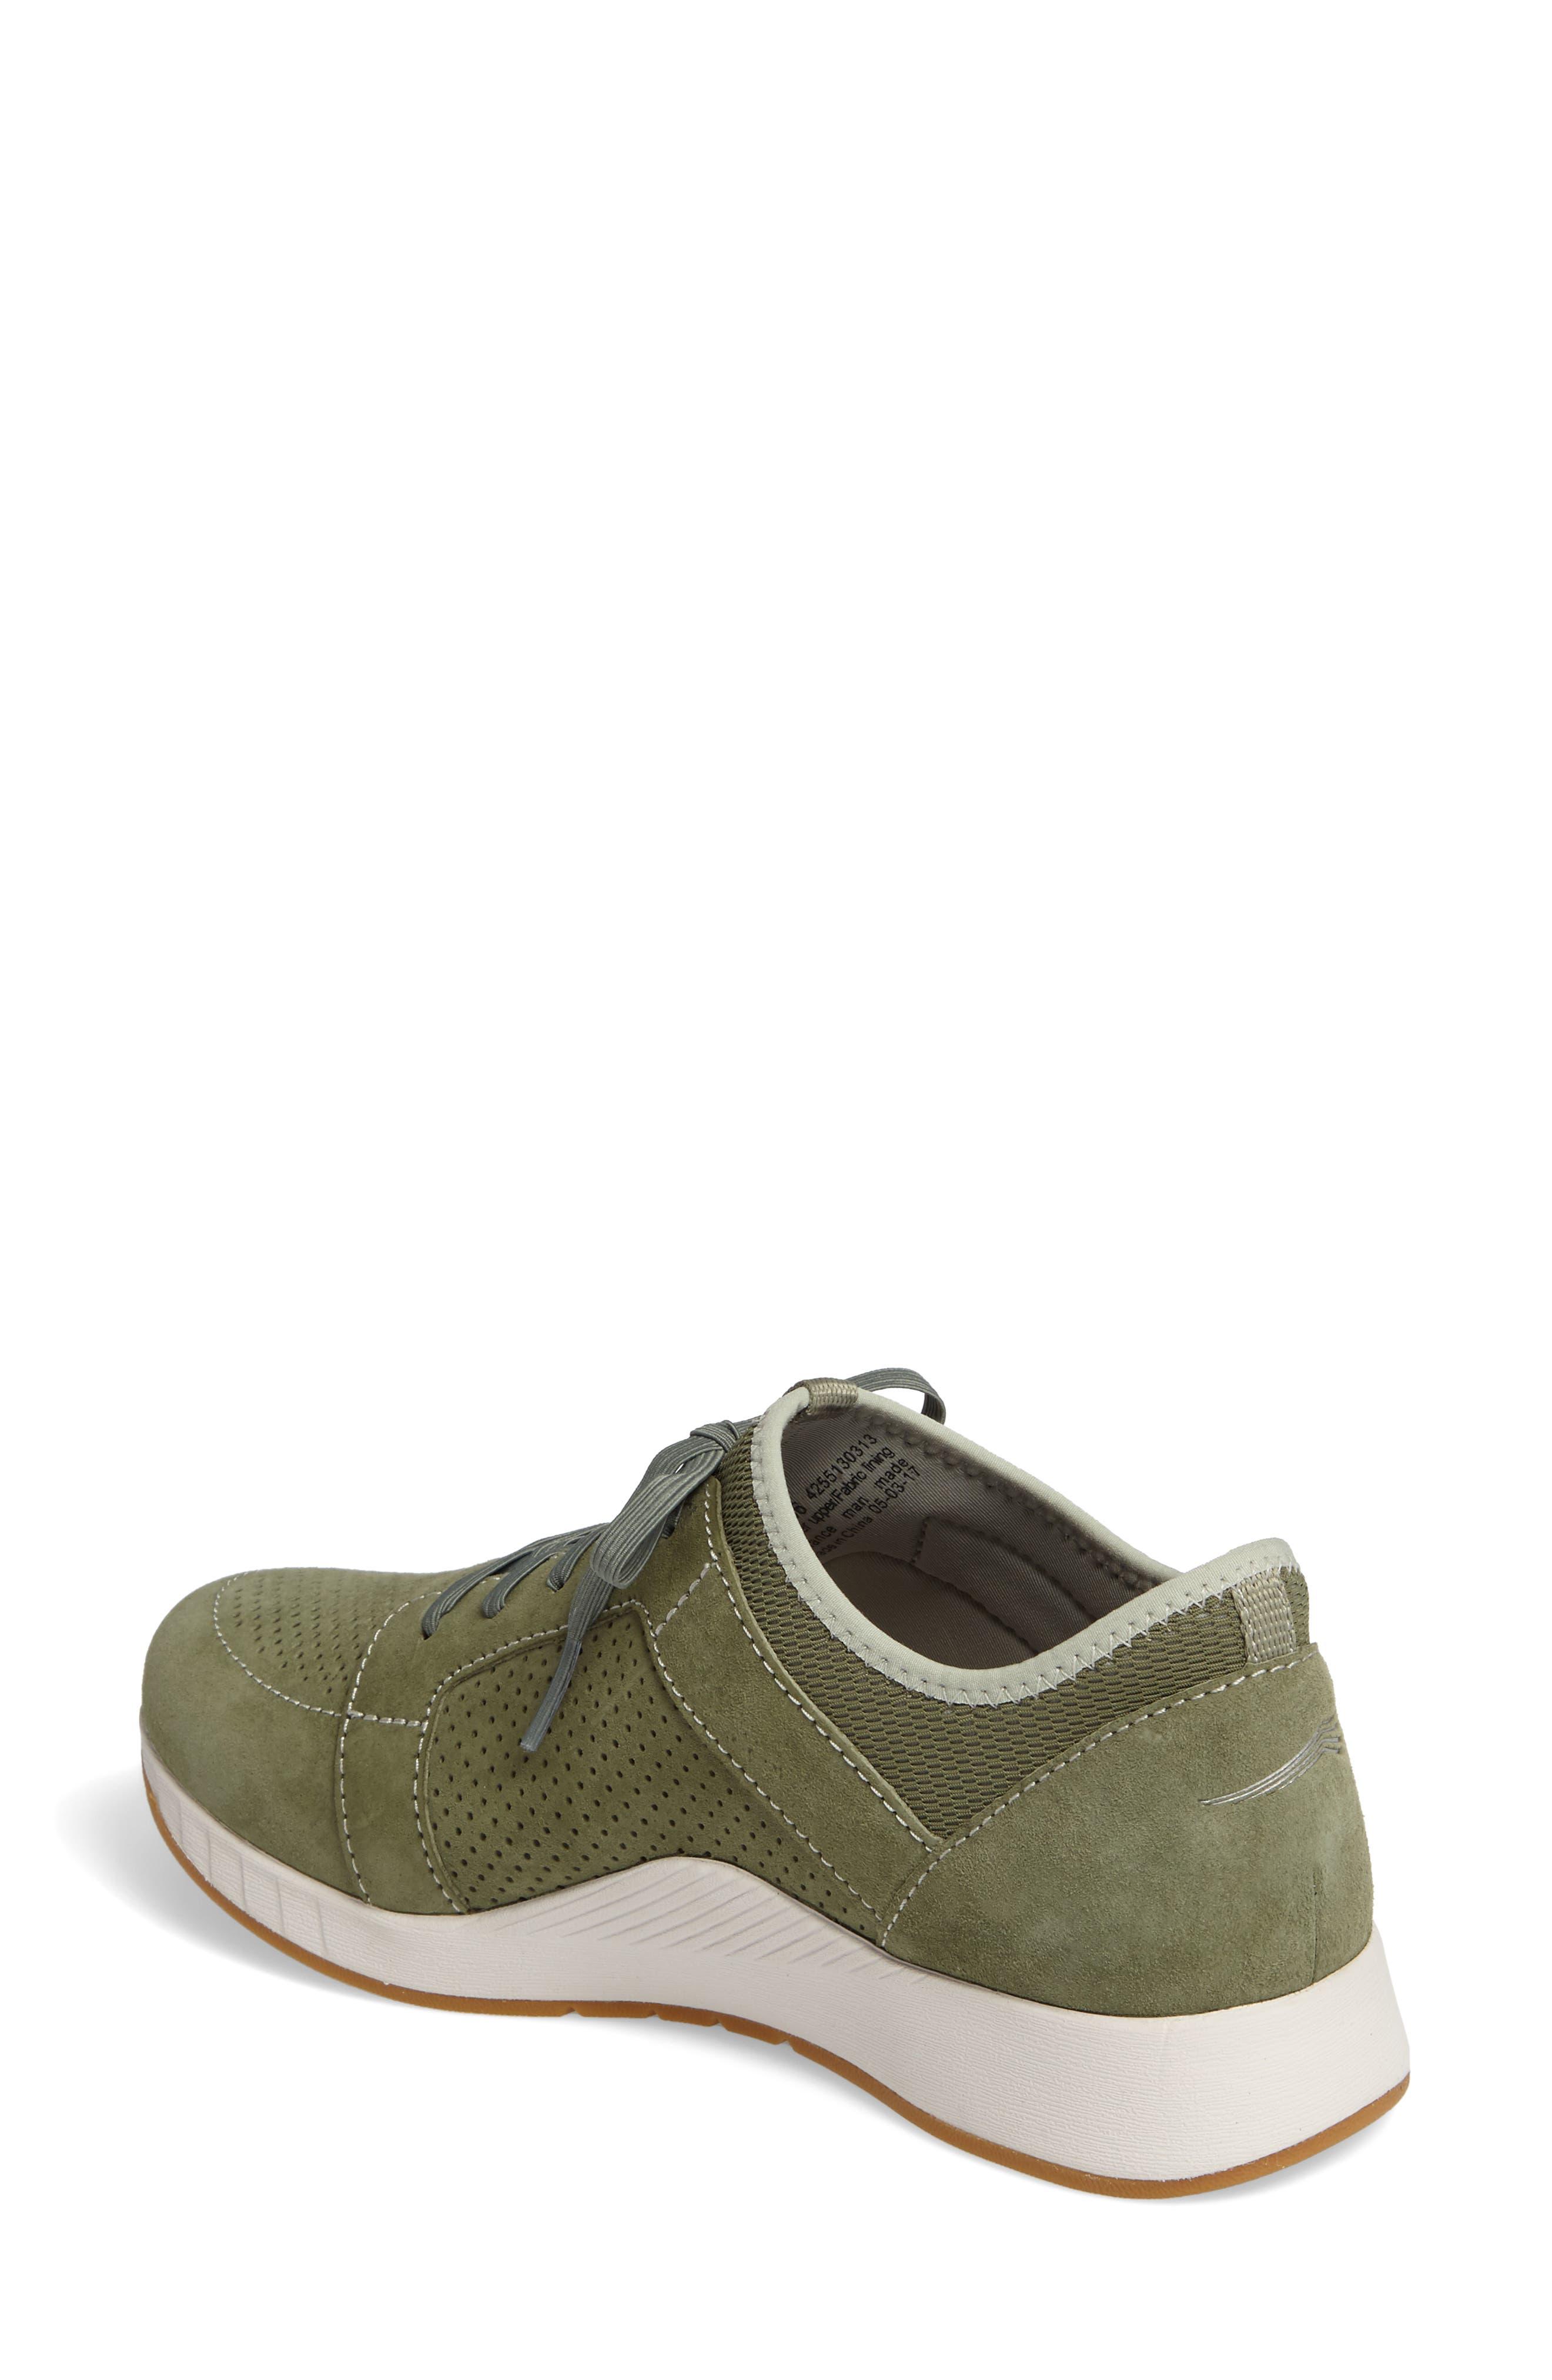 Cozette Slip-On Sneaker,                             Alternate thumbnail 2, color,                             Sage Suede